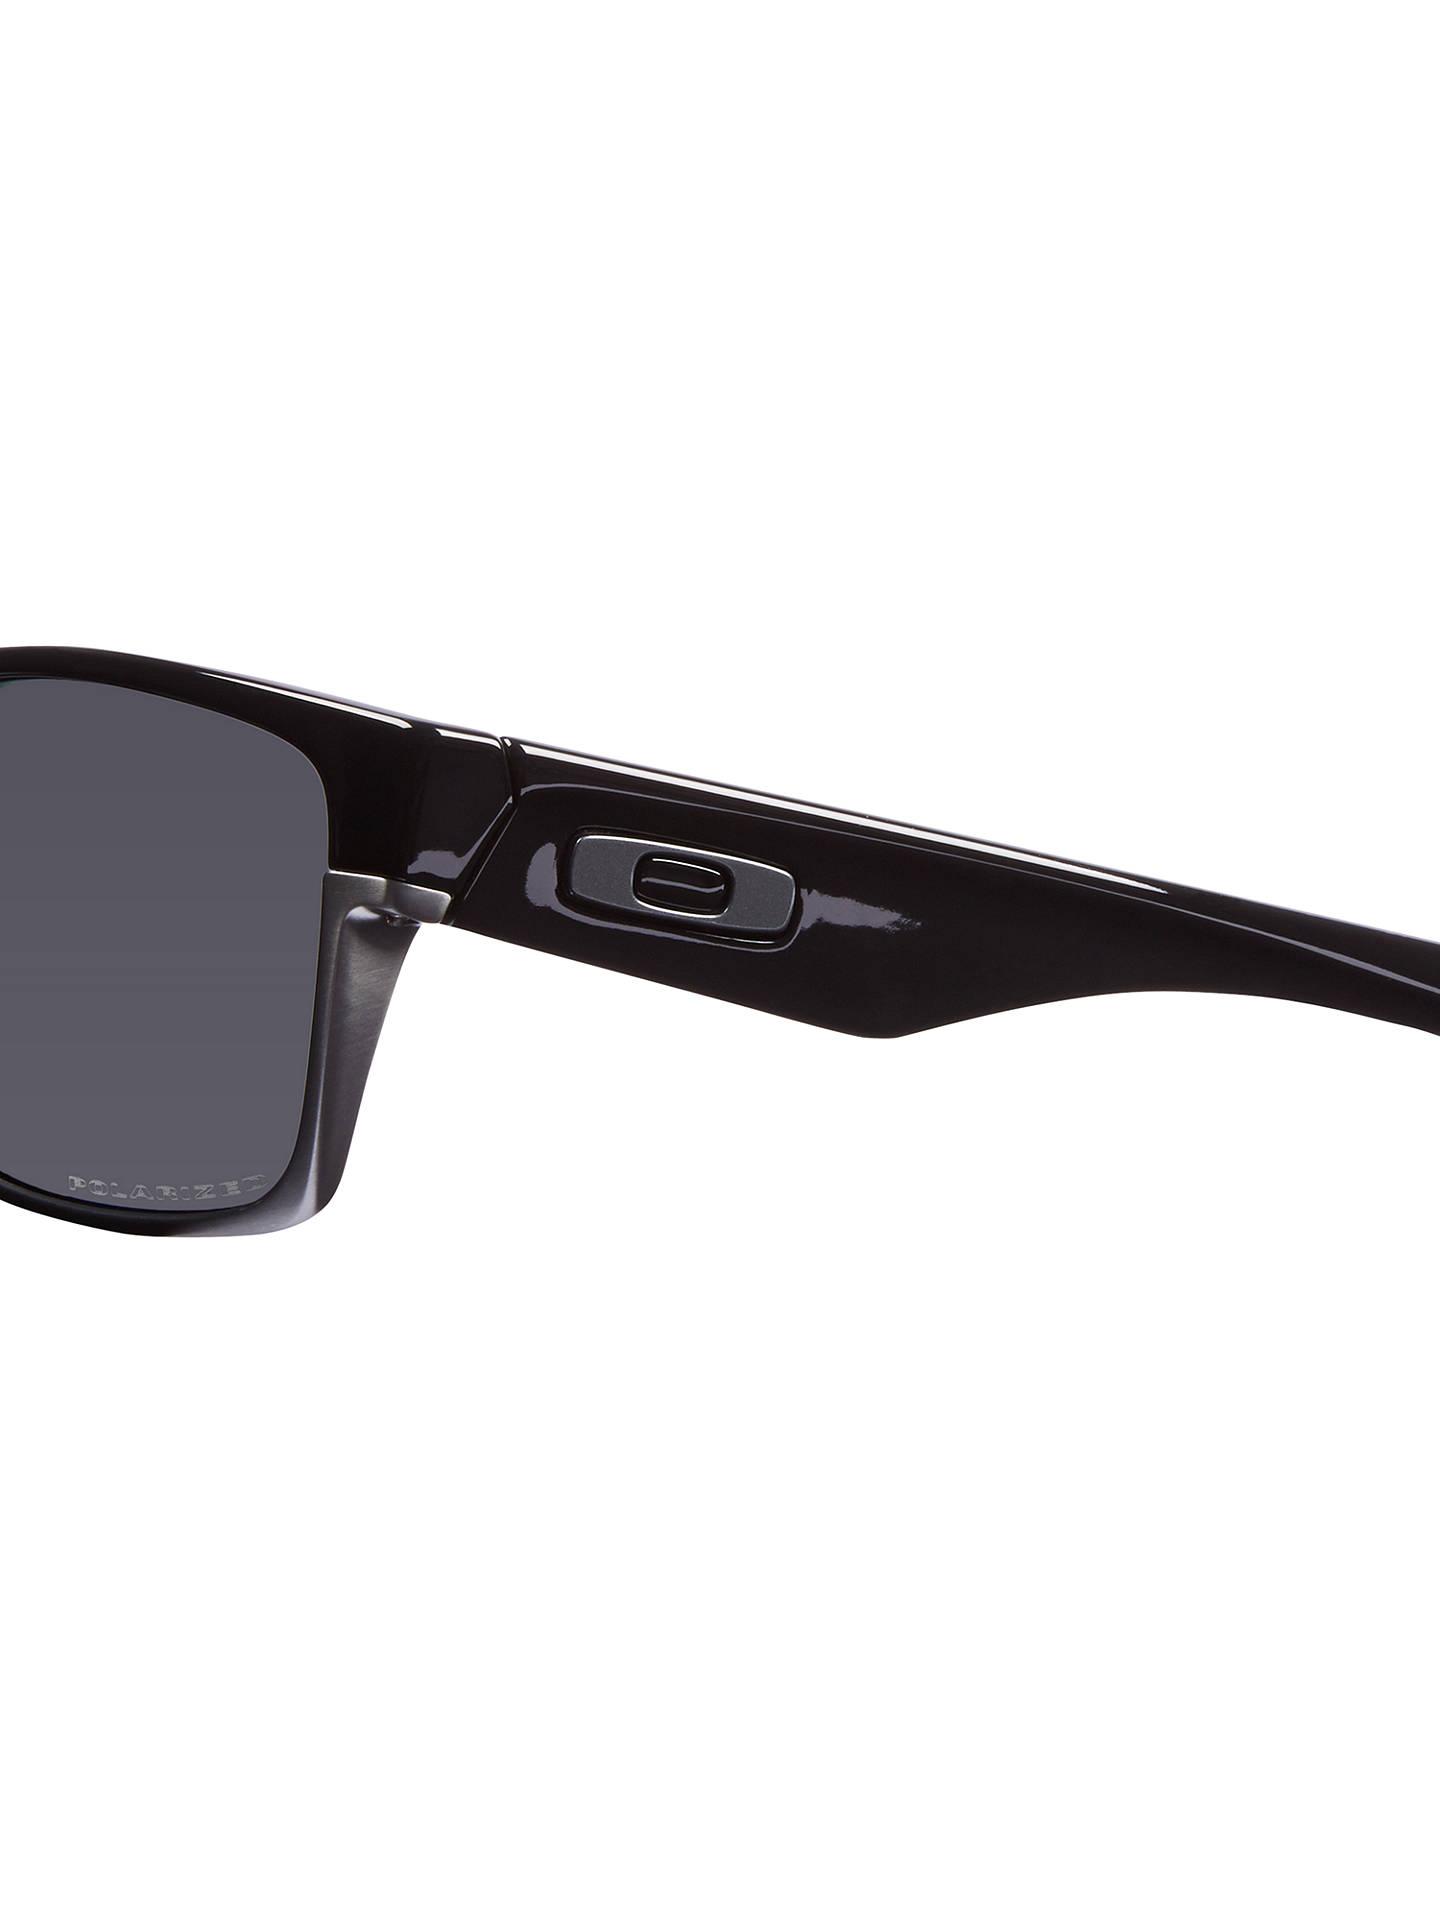 07aad5f5b5 BuyOakley 009189 Polarised Twoface™ Rectangular Frame Acetate Sunglasses